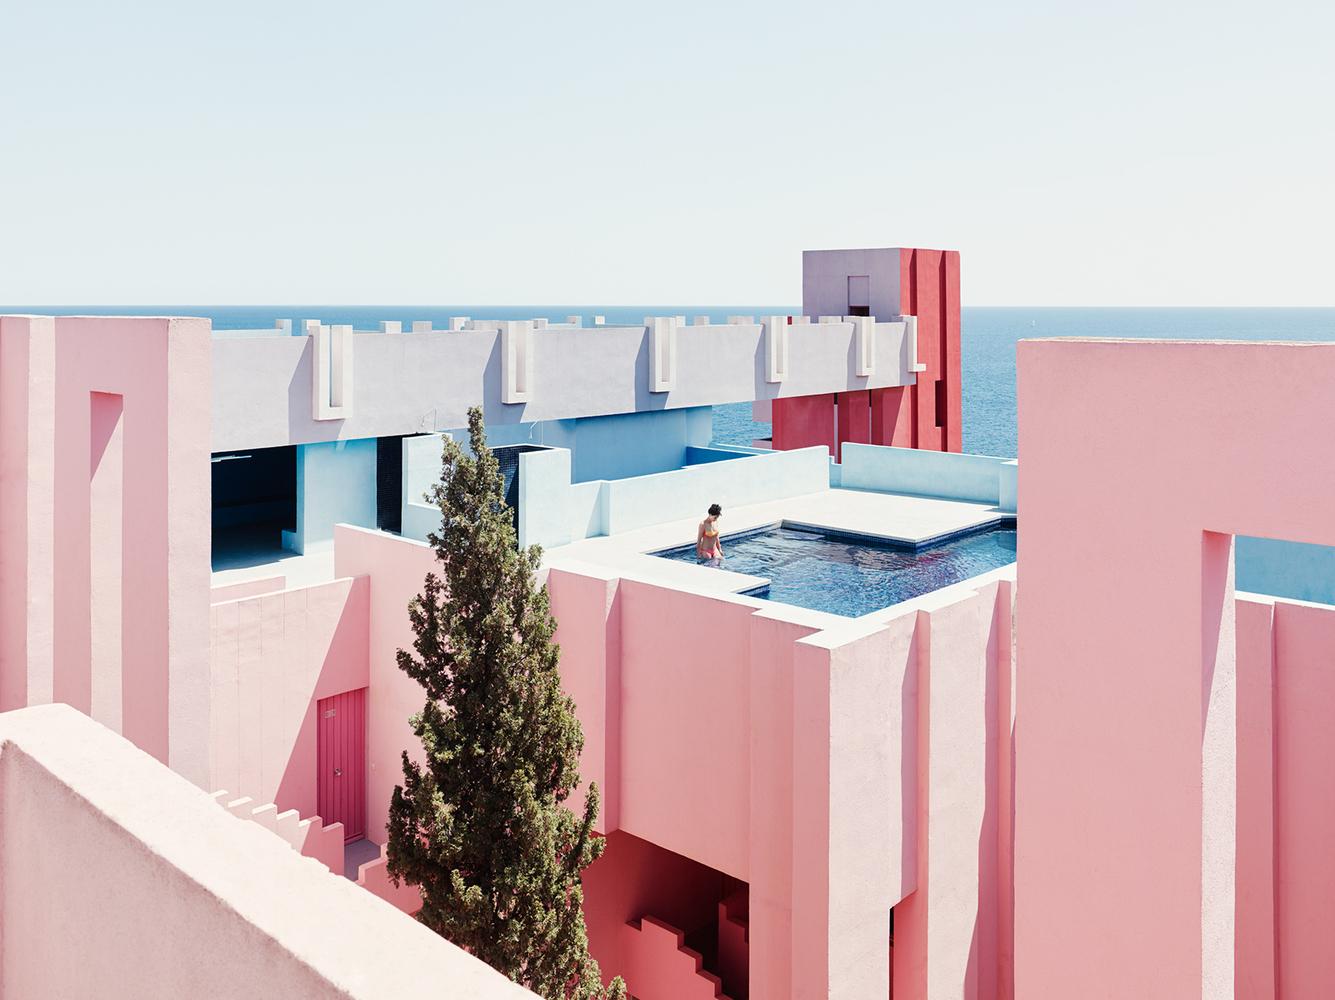 Un clásico: La Muralla Roja / Ricardo Bofill